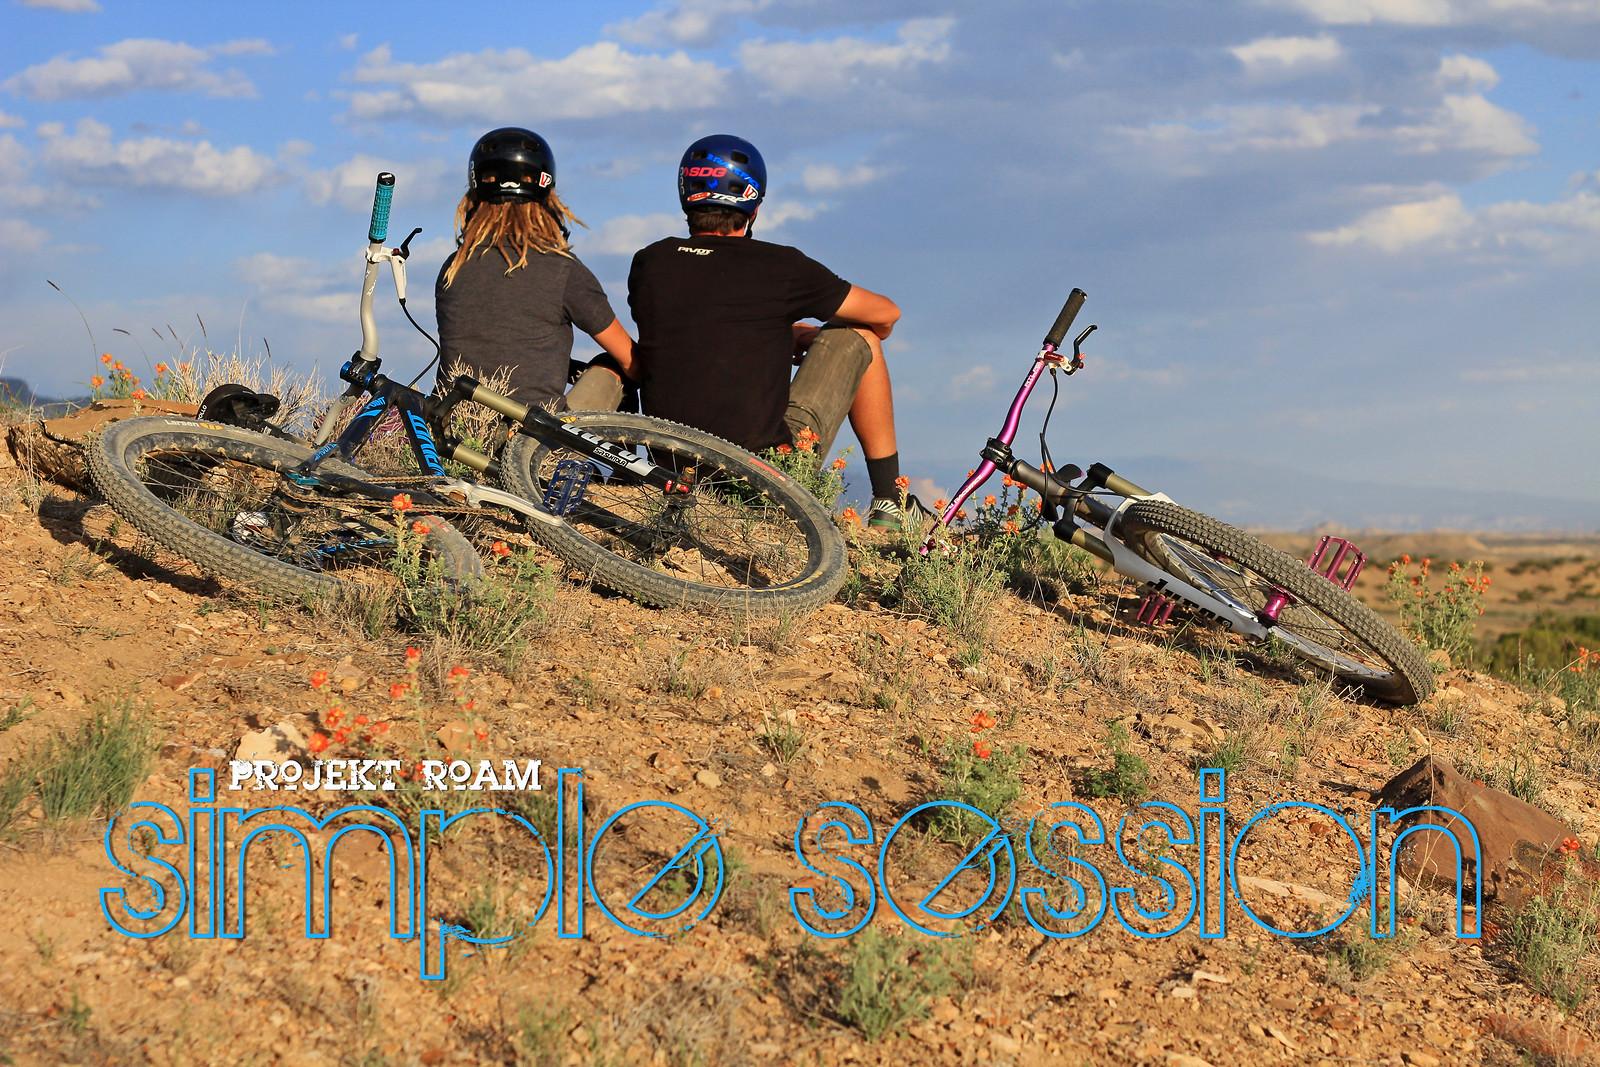 Simple Session Cover - projekt roam - Mountain Biking Pictures - Vital MTB